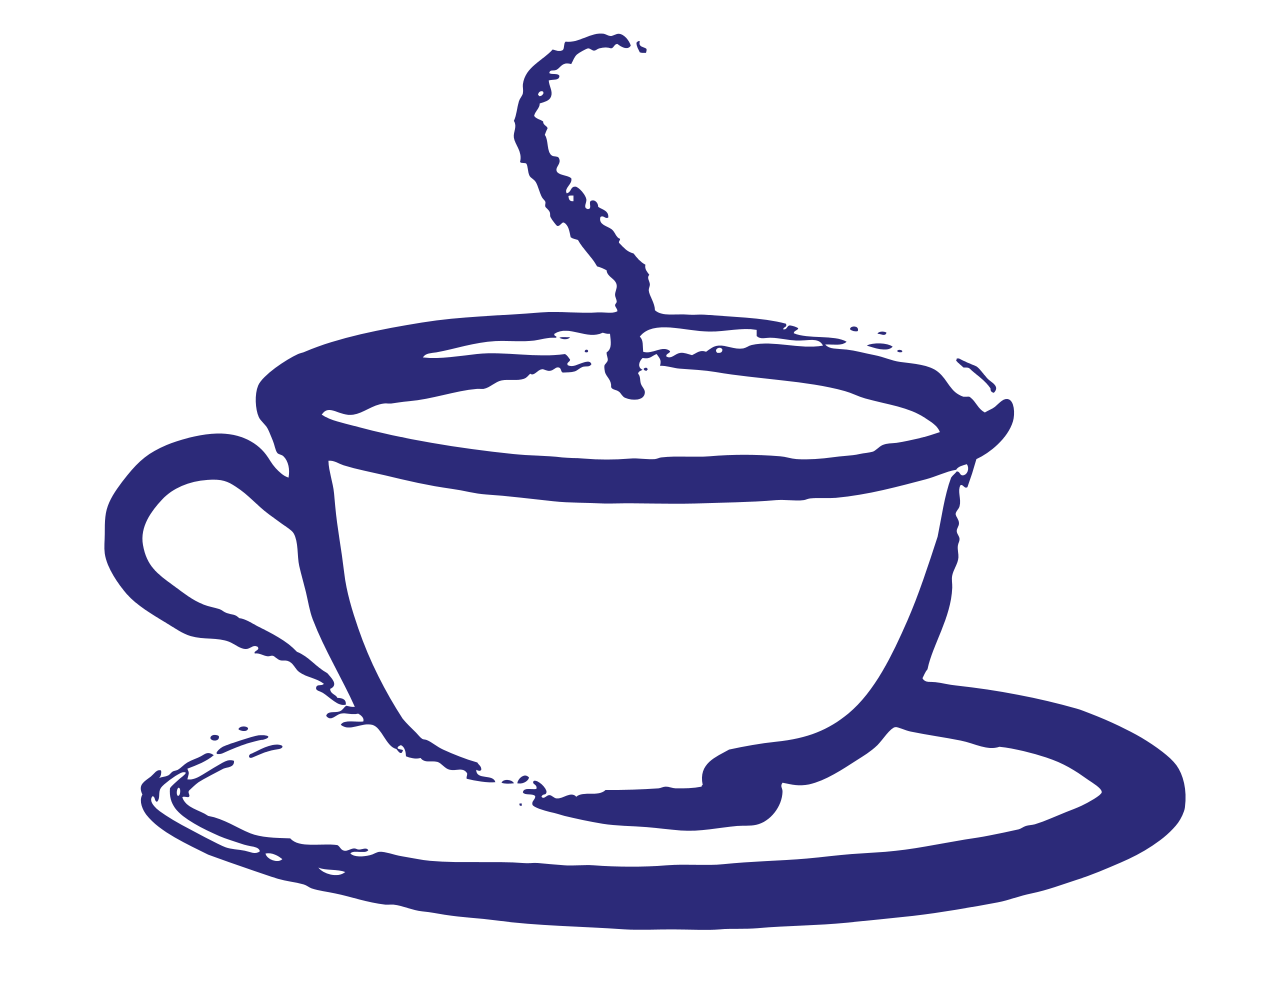 Tea clipart spice.  teacup with file